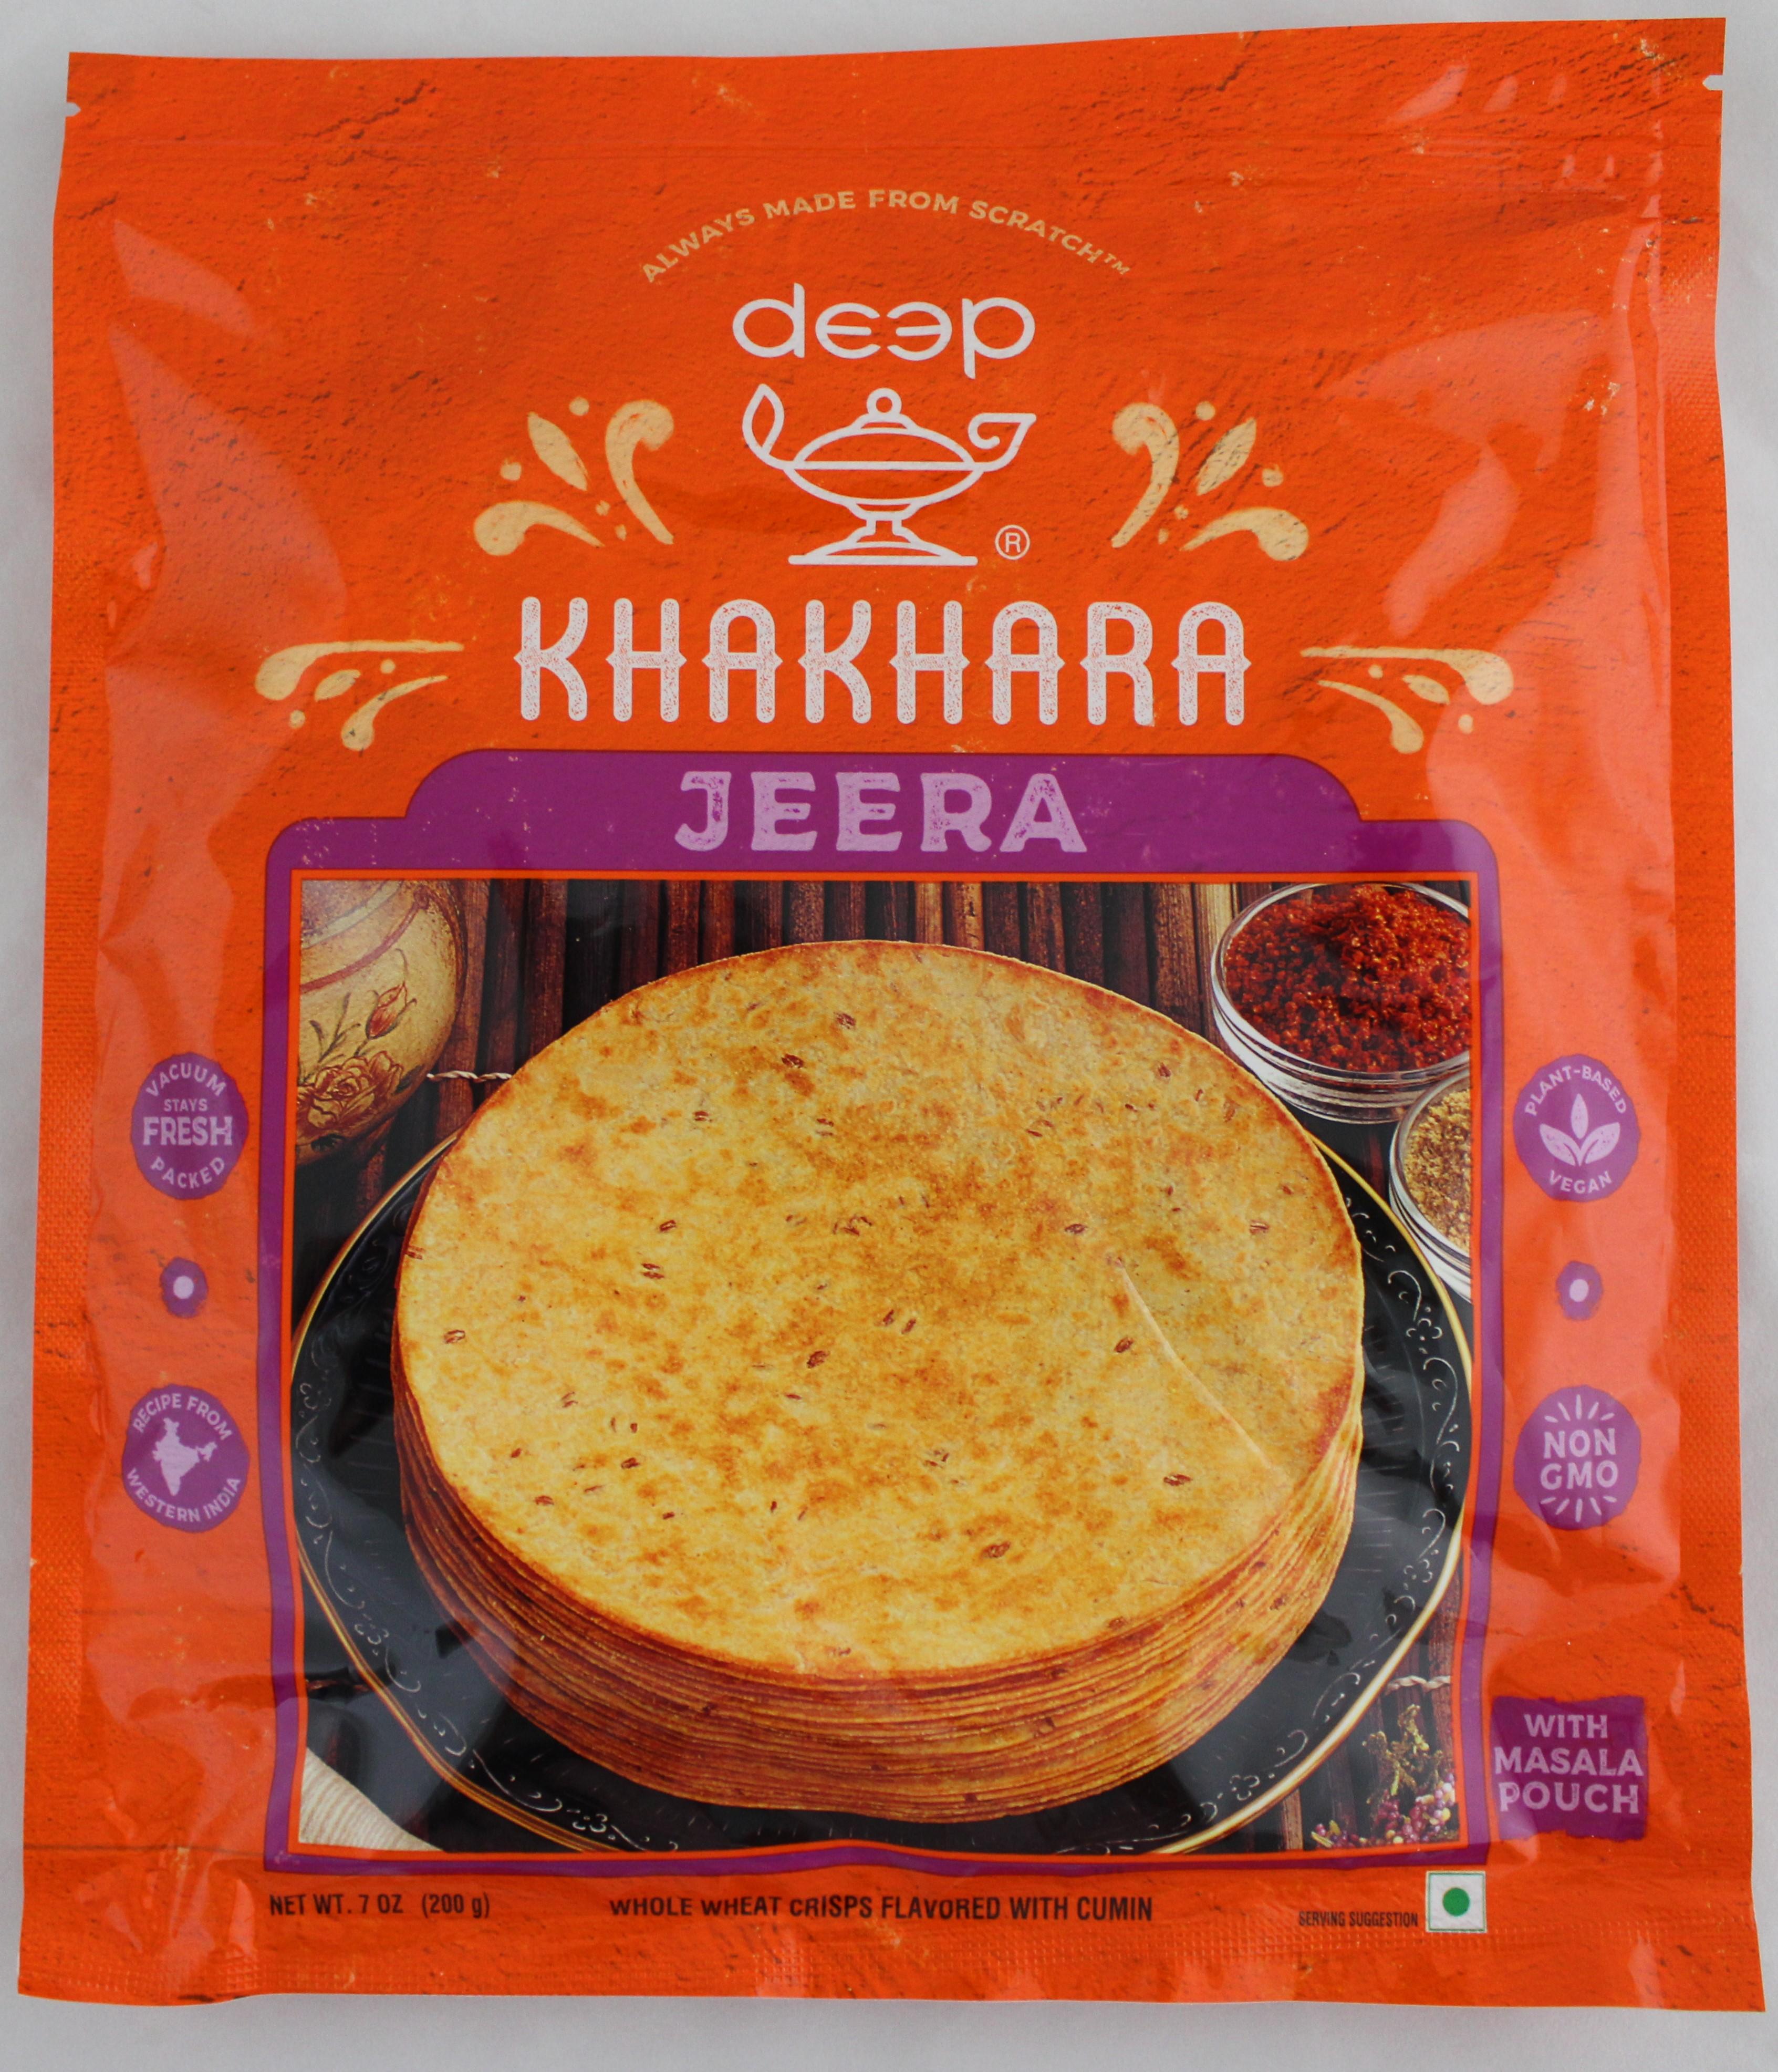 Indian Grocery - Jeera Khahkhra 7 oz.